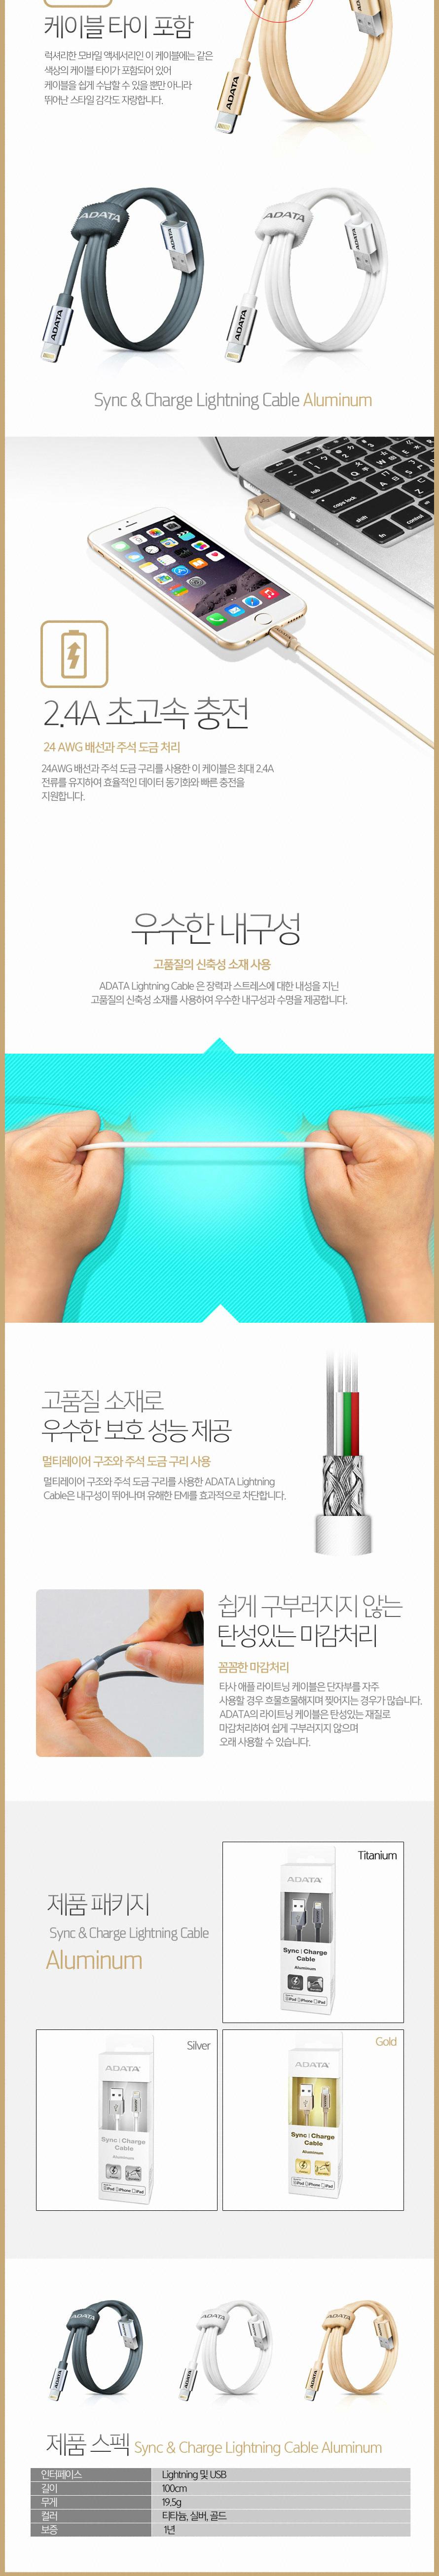 ADATA  라이트닝 8핀 고속충전 케이블 AMFIPL(1m)